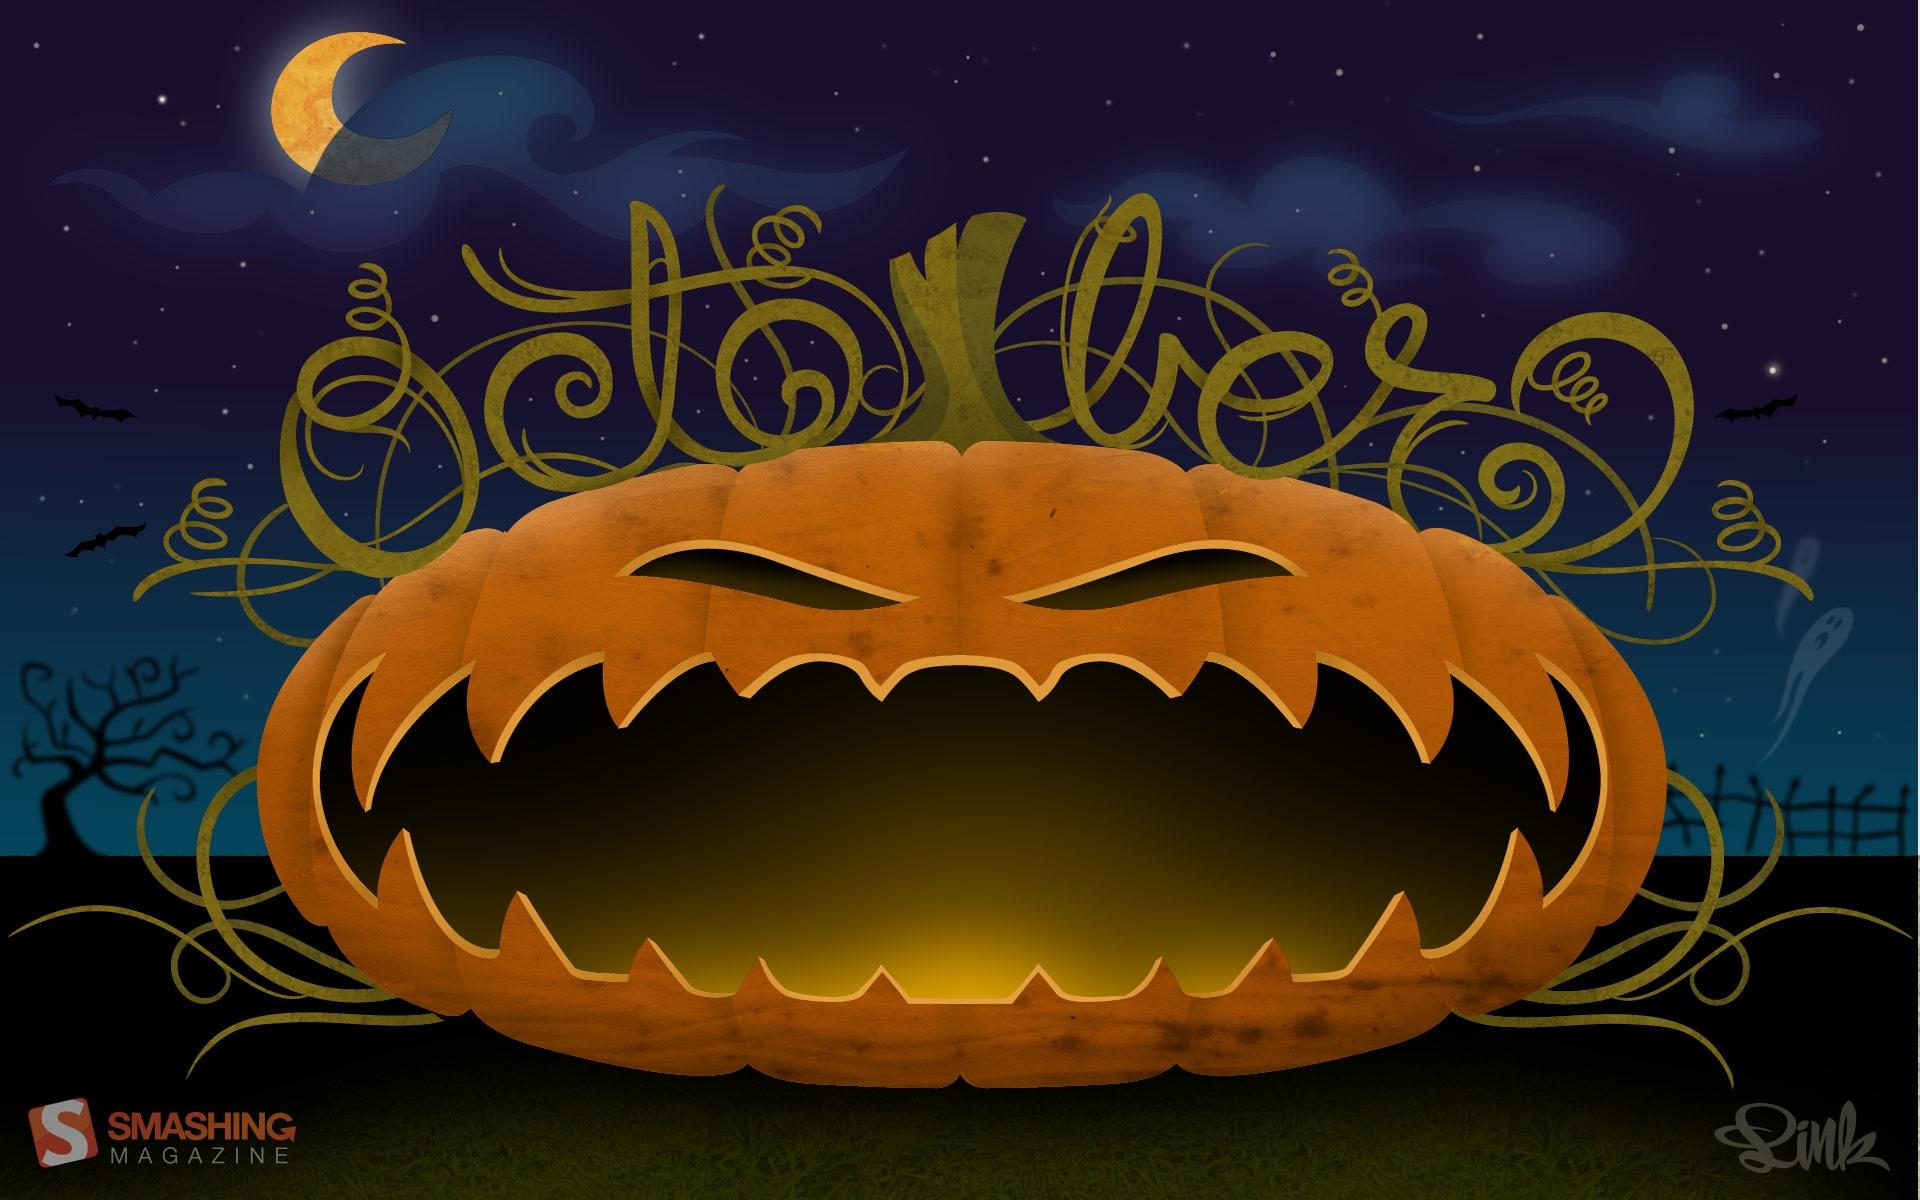 halloween desktop wallpapers free on latorocom - Desktop Wallpaper Halloween